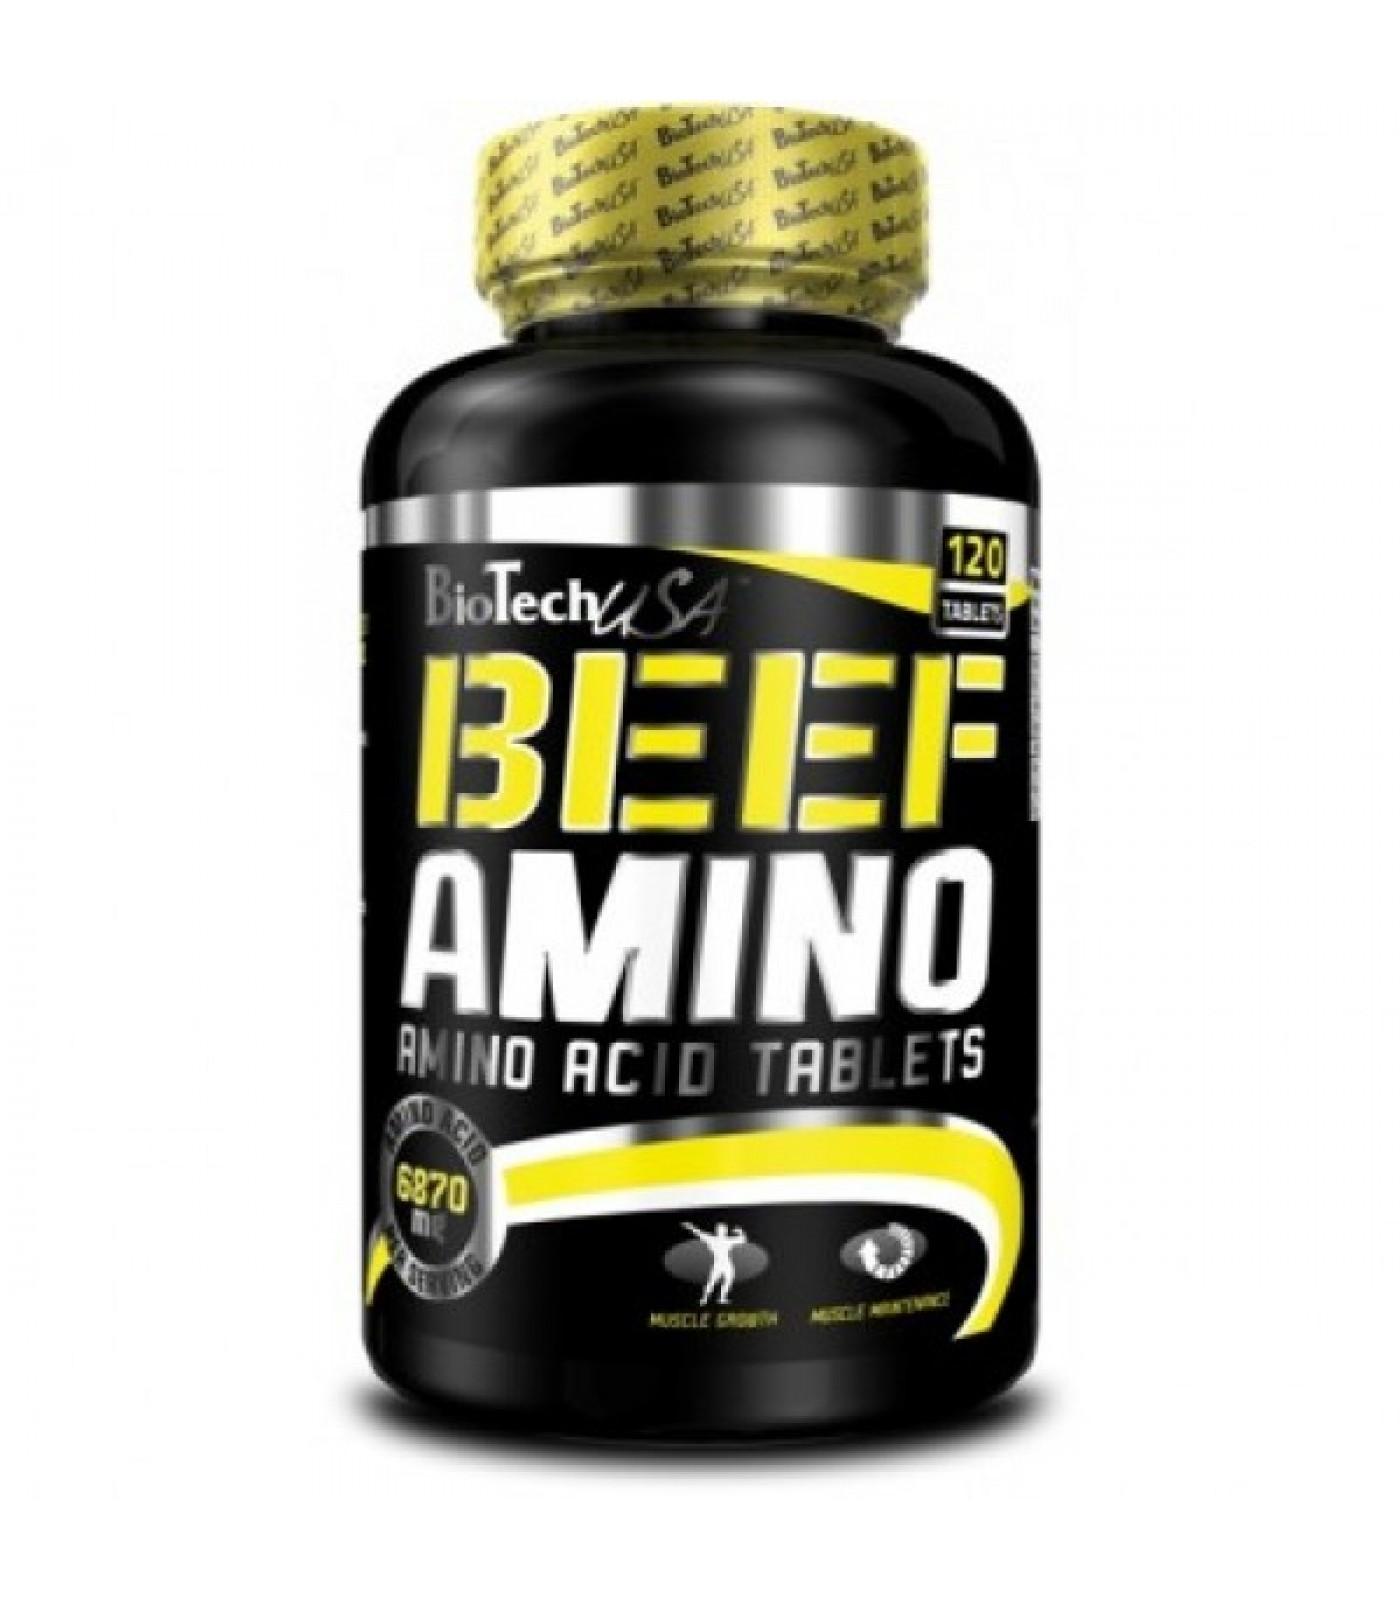 BioTech - Beef Amino / 120 Tabs.